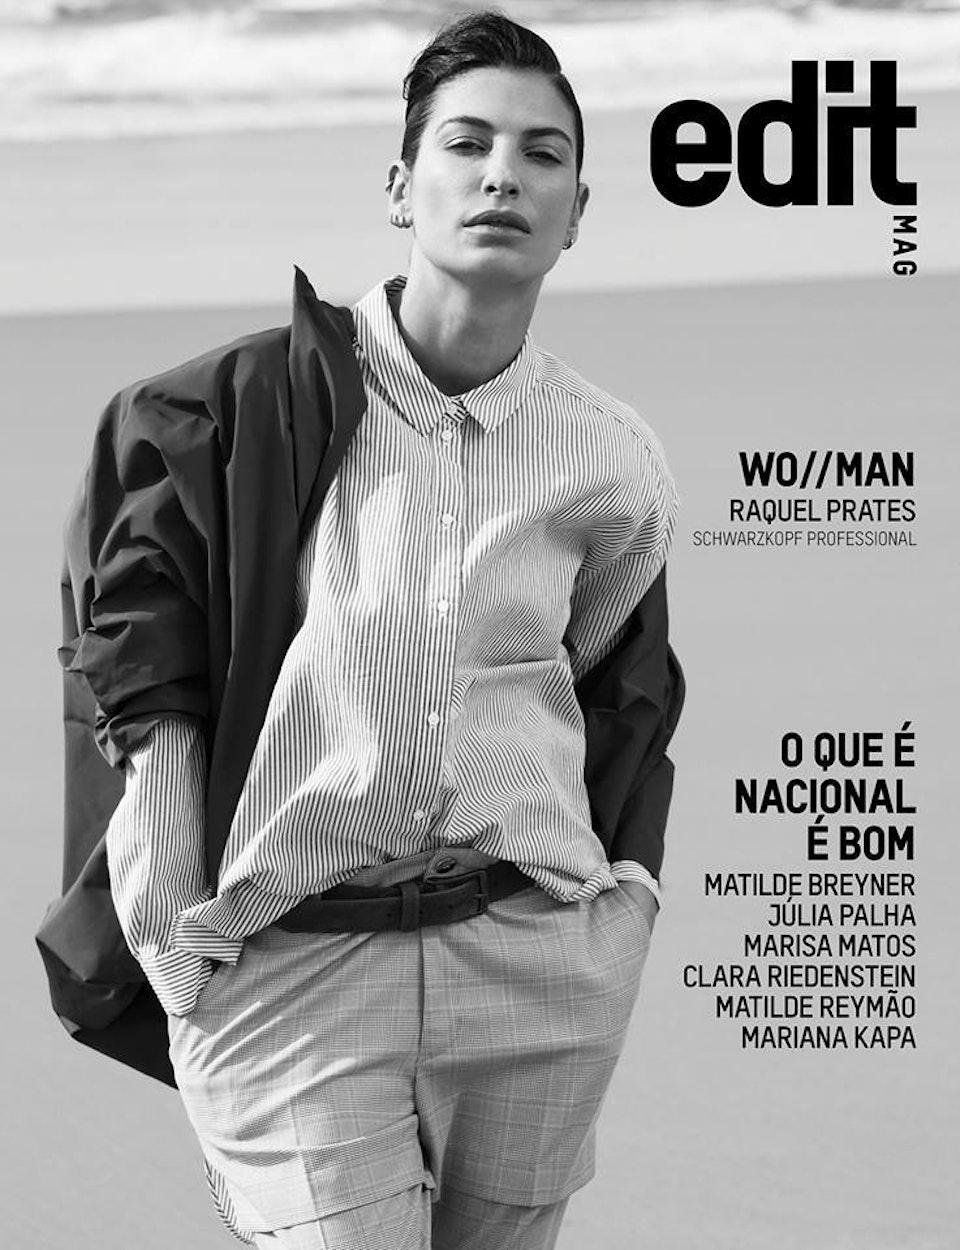 'Raquel Prates / Woman' - Edit Mag wo_man_capa